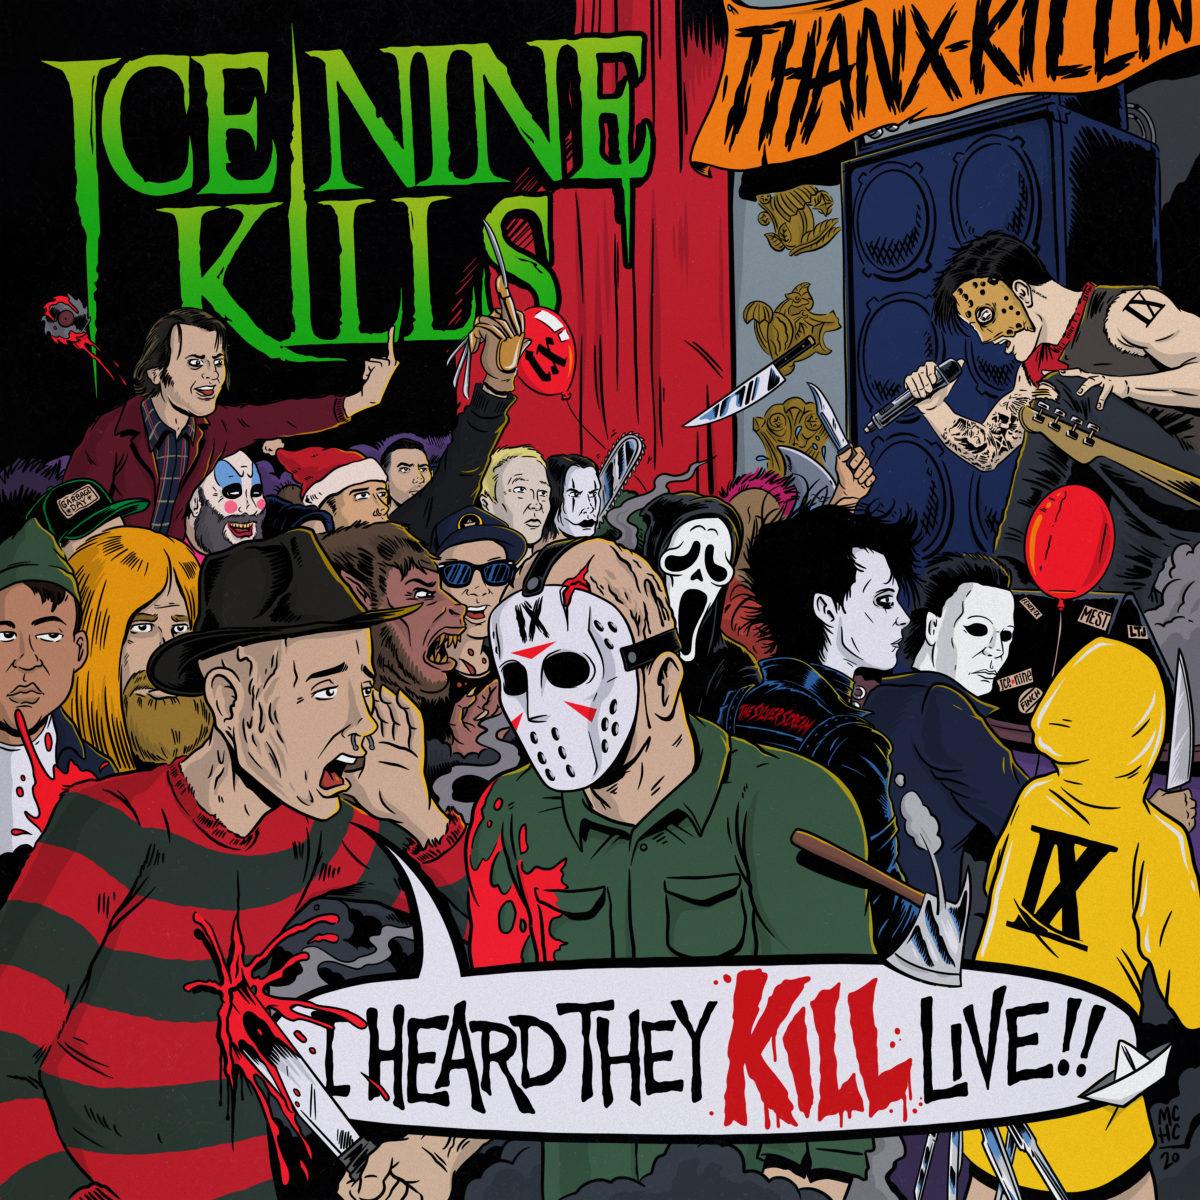 Ice Nine Kills - I Heard They Kill Live Albumcover